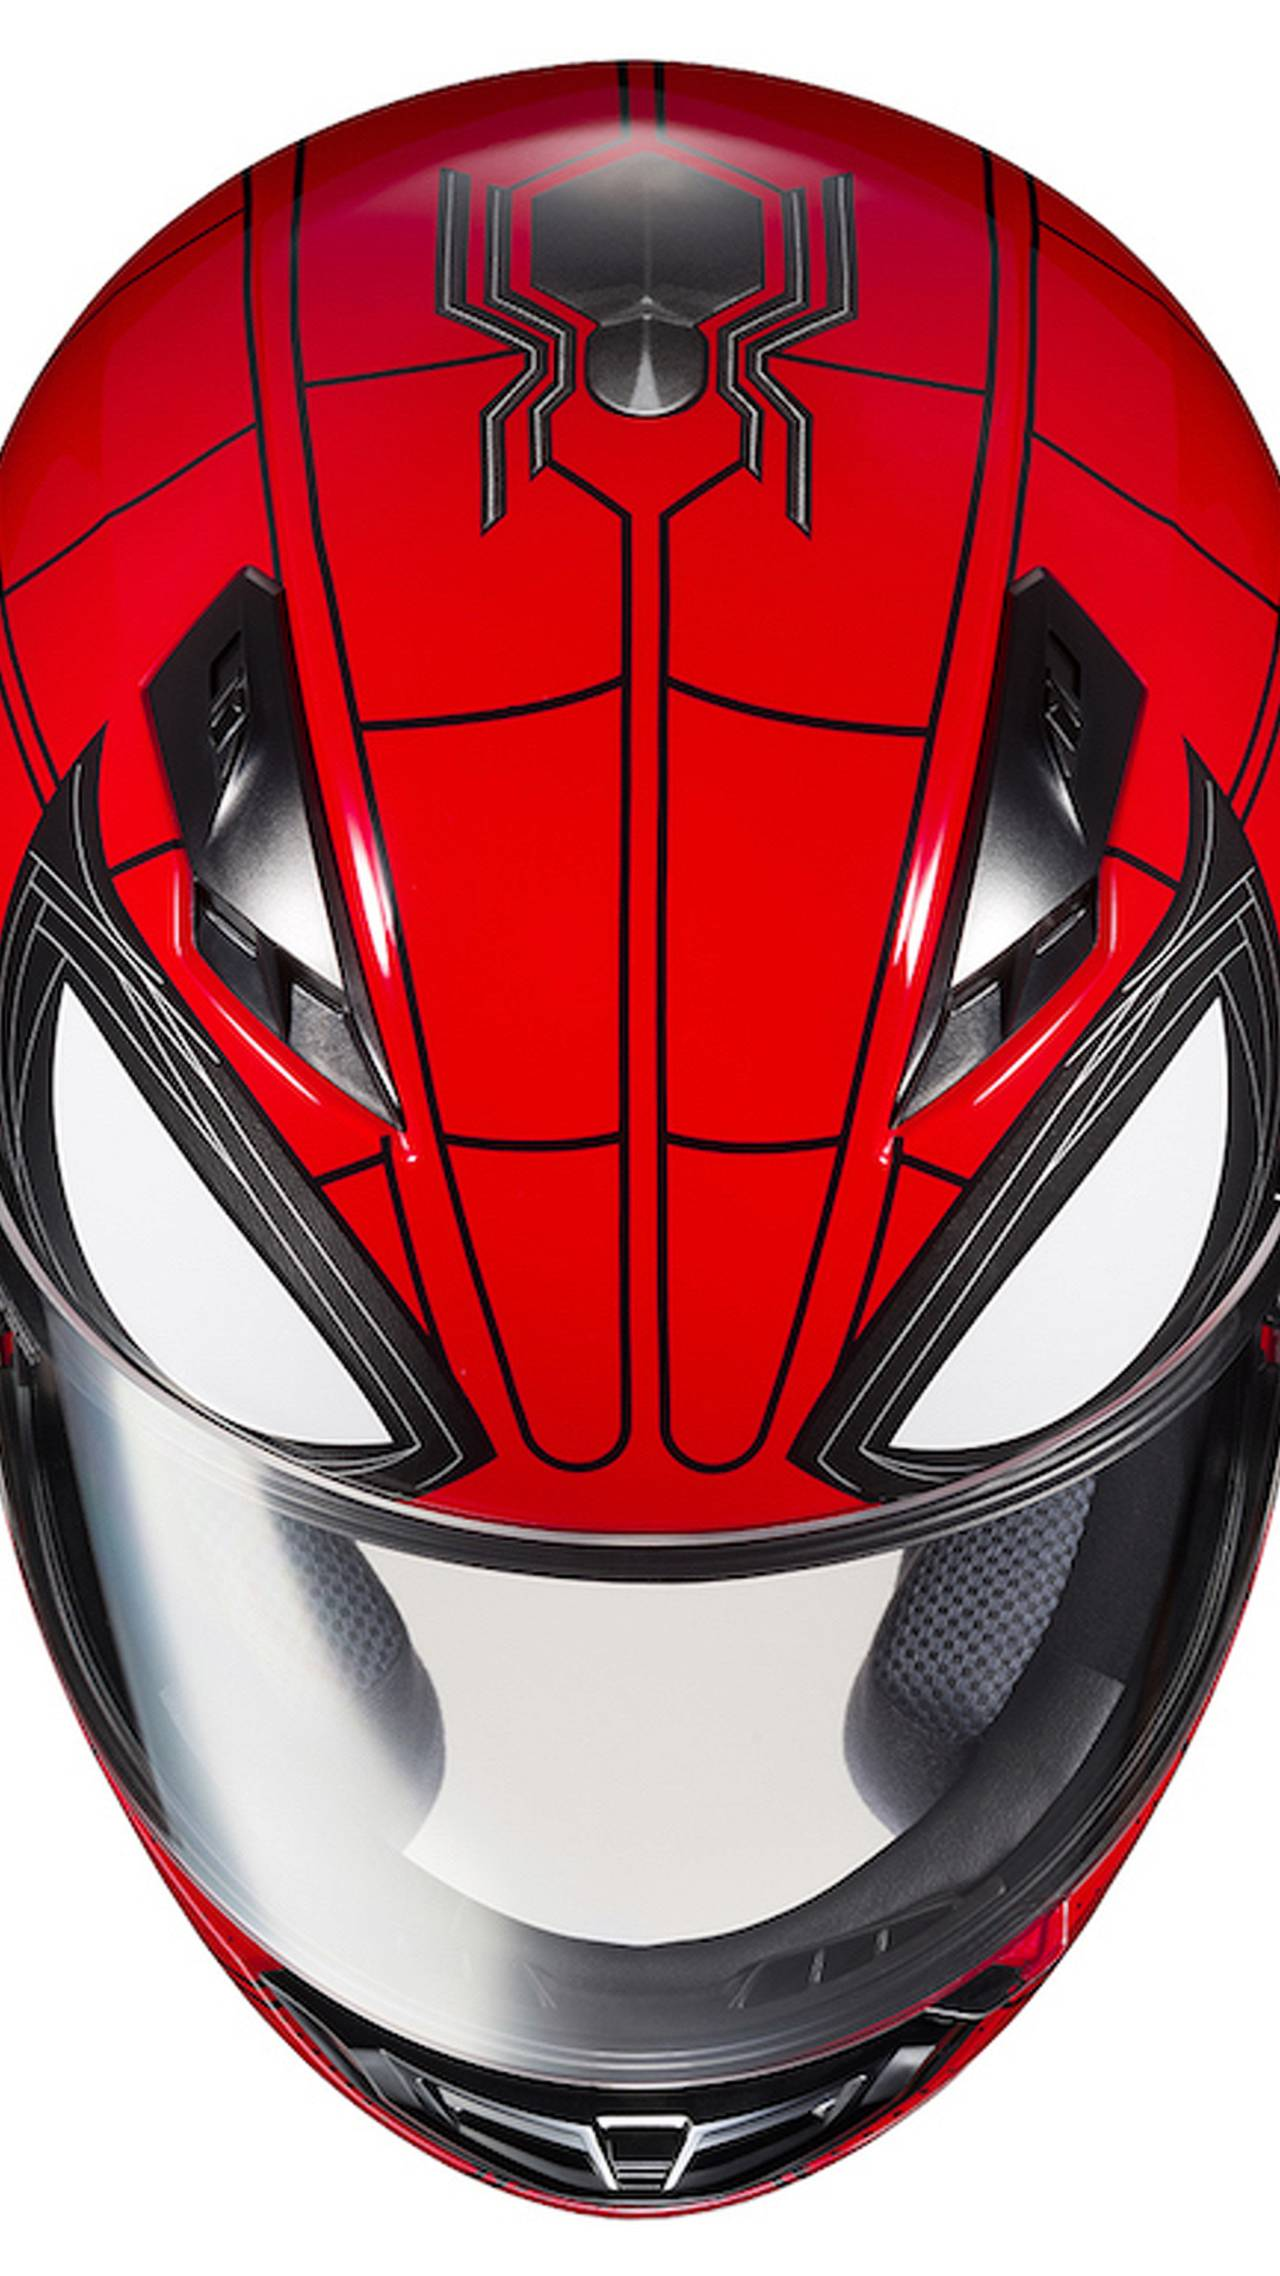 HJC Adds New Marvel Comics Helmets to Lineup